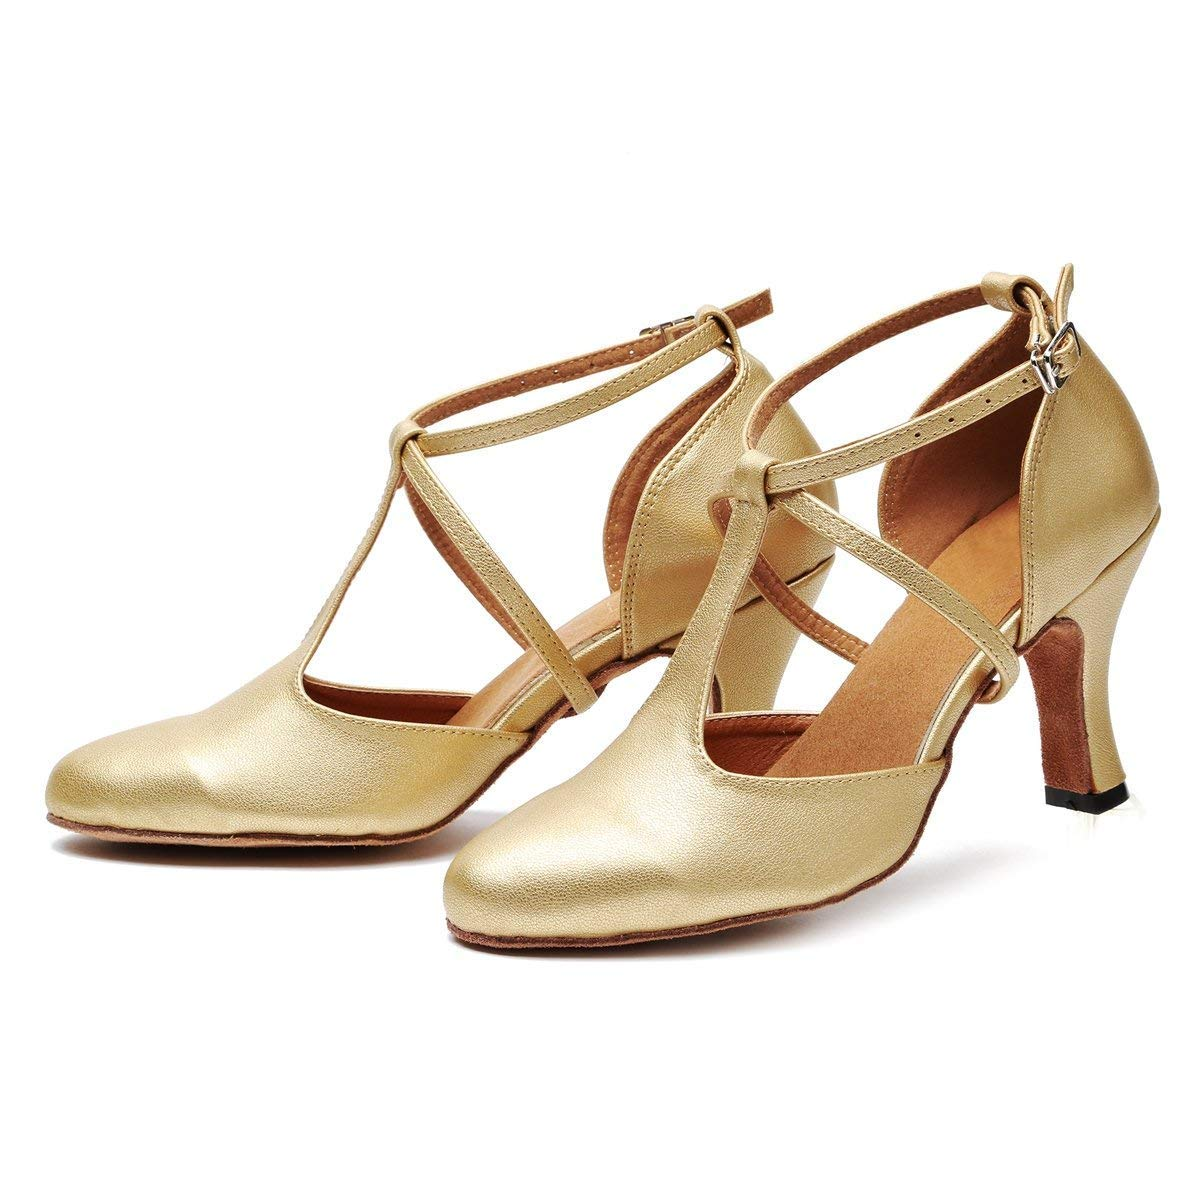 Qiusa Frauen T-Strap Ballroom Latin Salsa Tanzschuhe Gold Braut Braut Gold Hochzeit Pumps UK 4.5 (Farbe   - Größe   -) 25b5f2